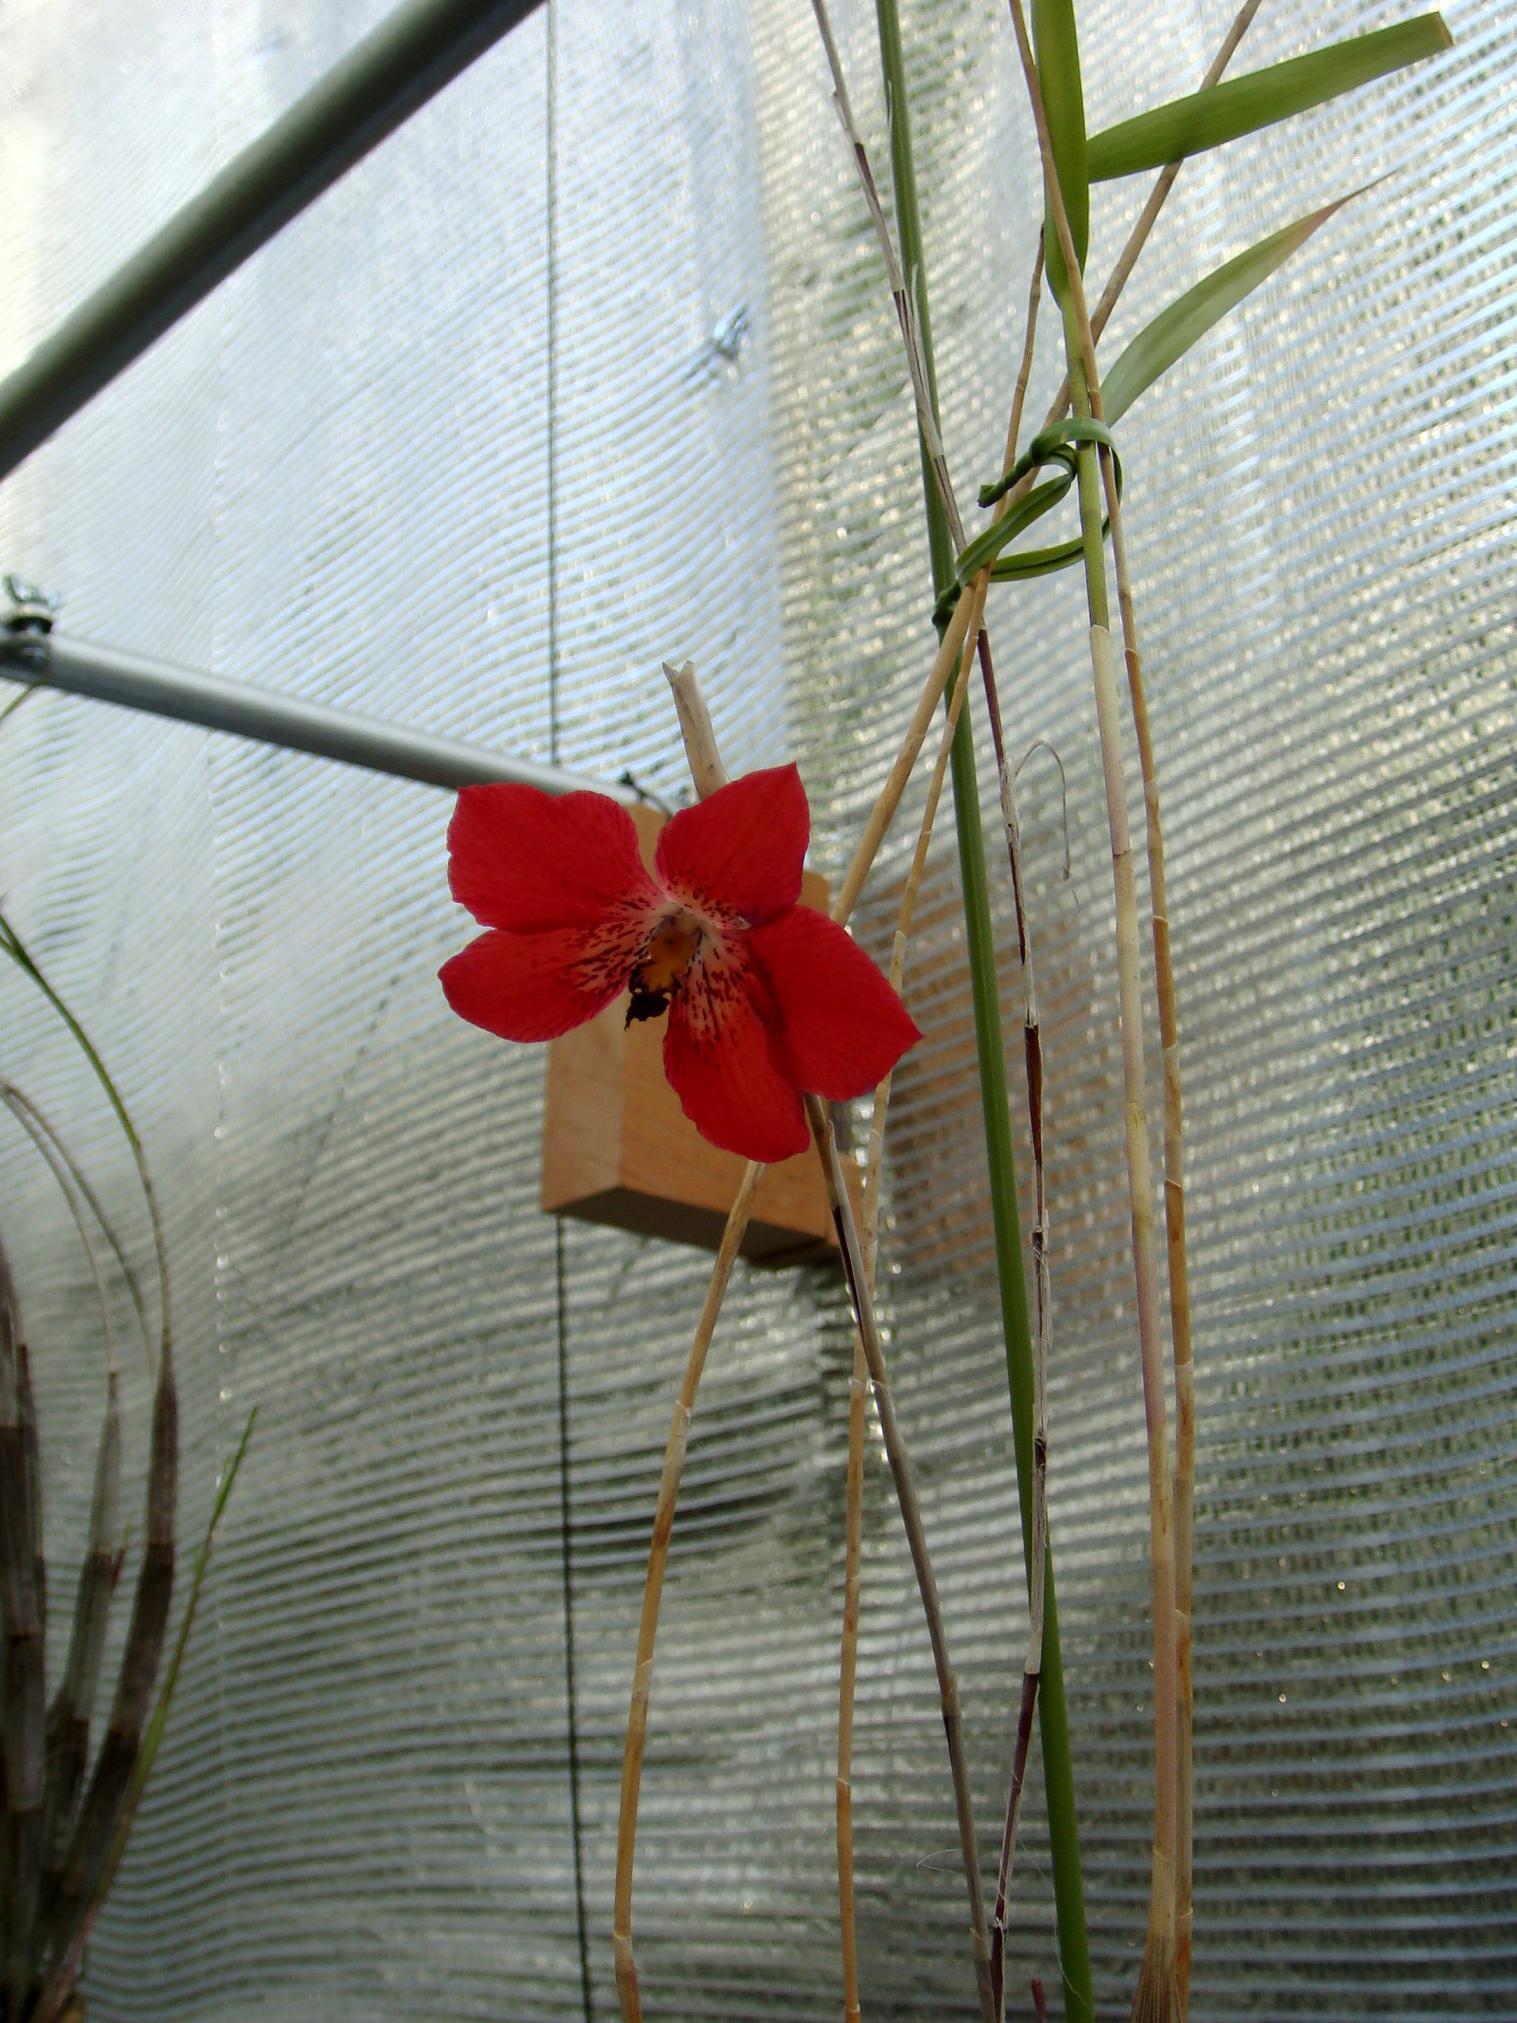 http://orchids.la.coocan.jp/Dendrobium/Dendrobium%20cinnabarinum/DSC04666.JPG